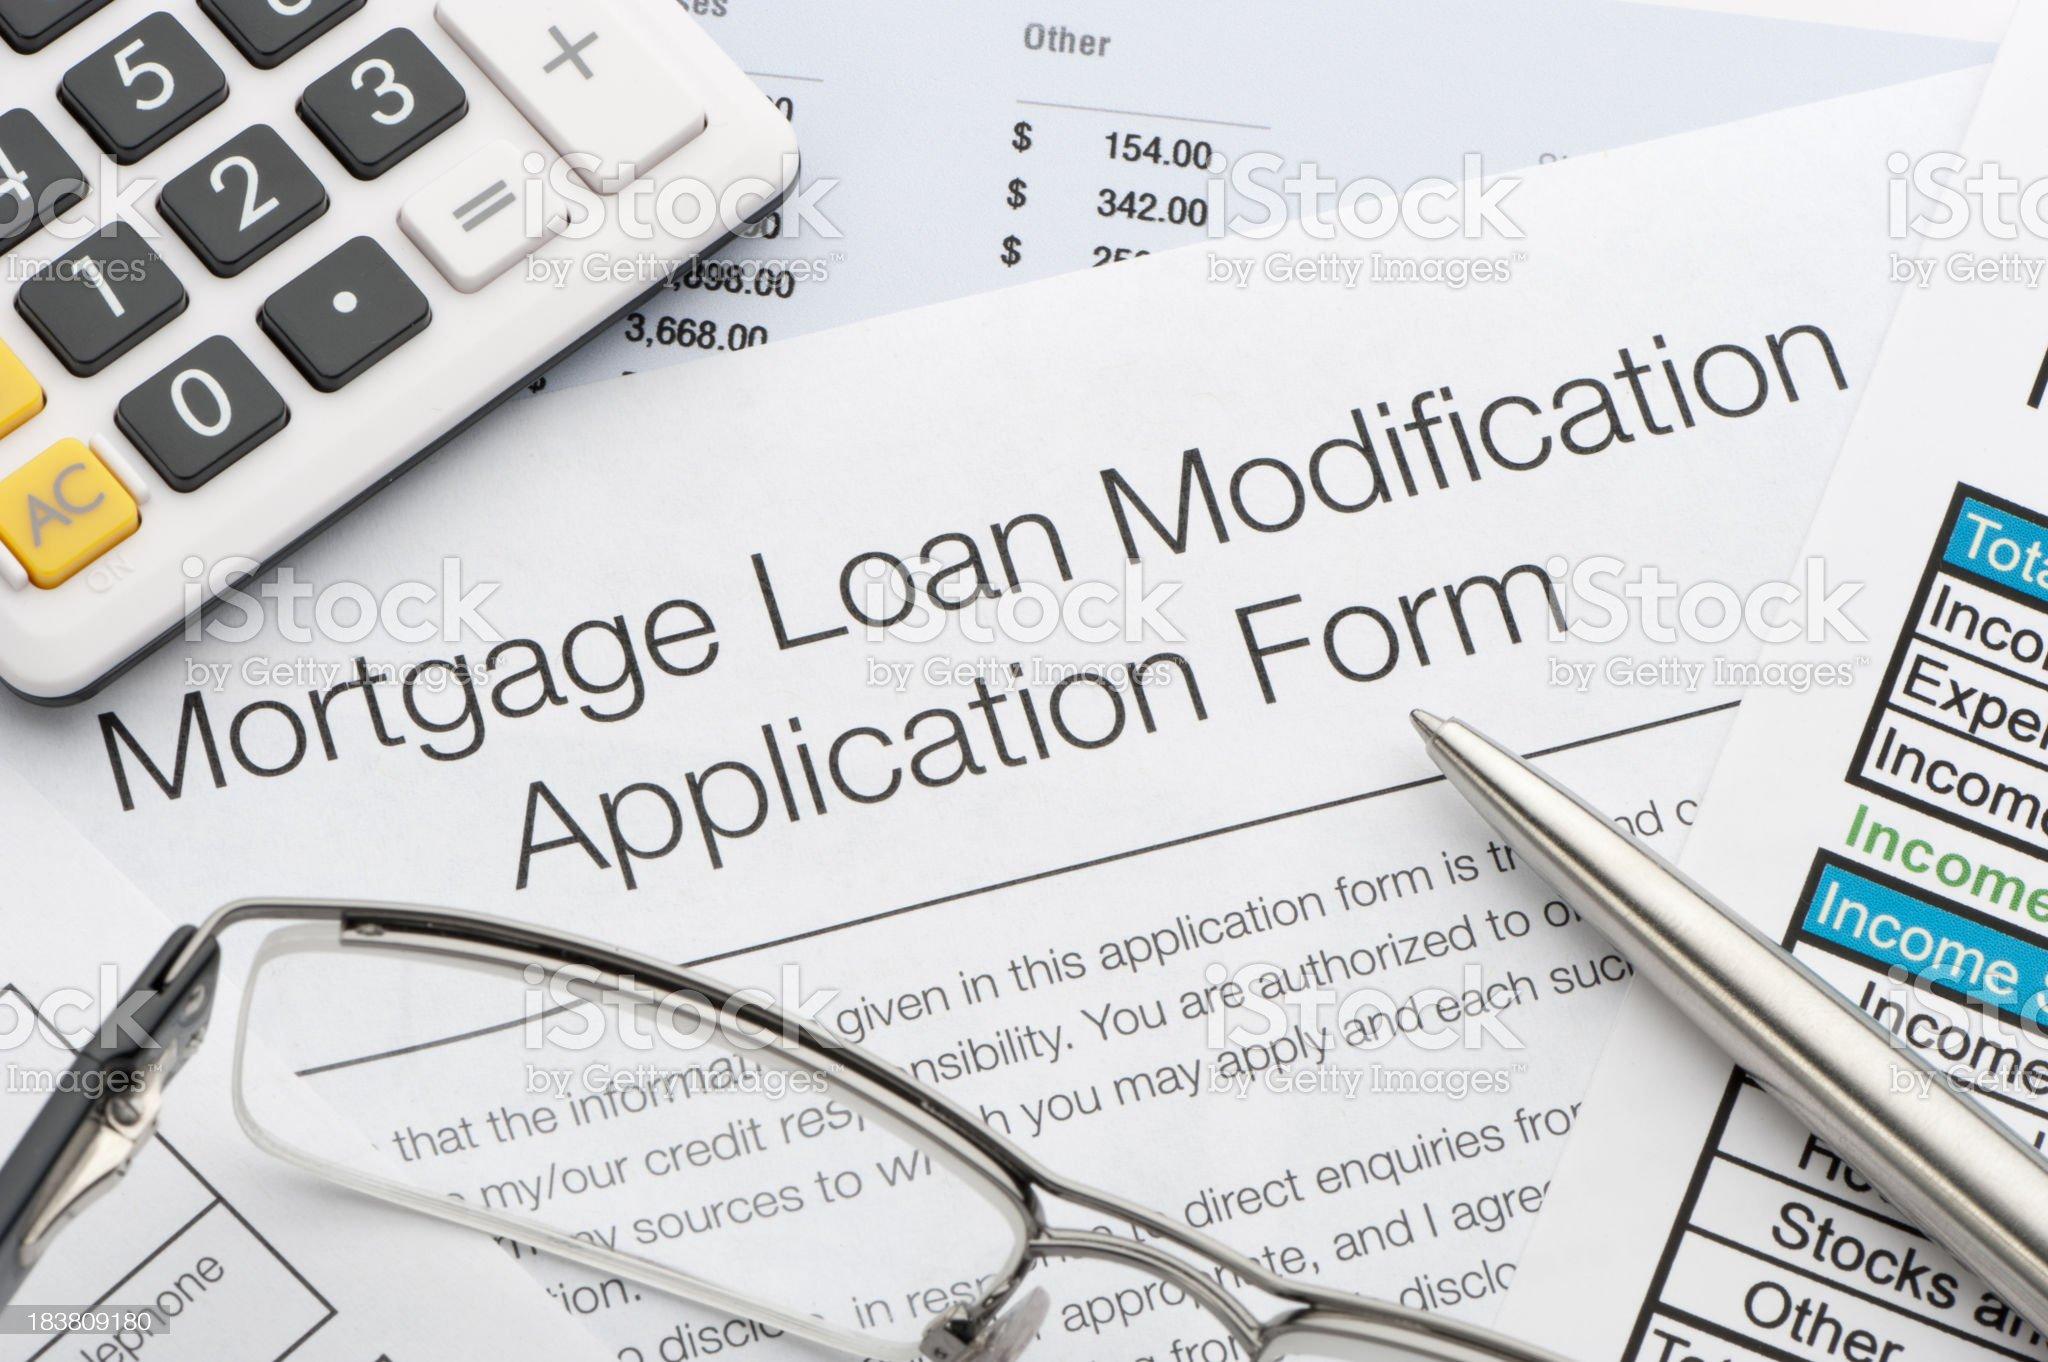 Mortgage loan modification application royalty-free stock photo